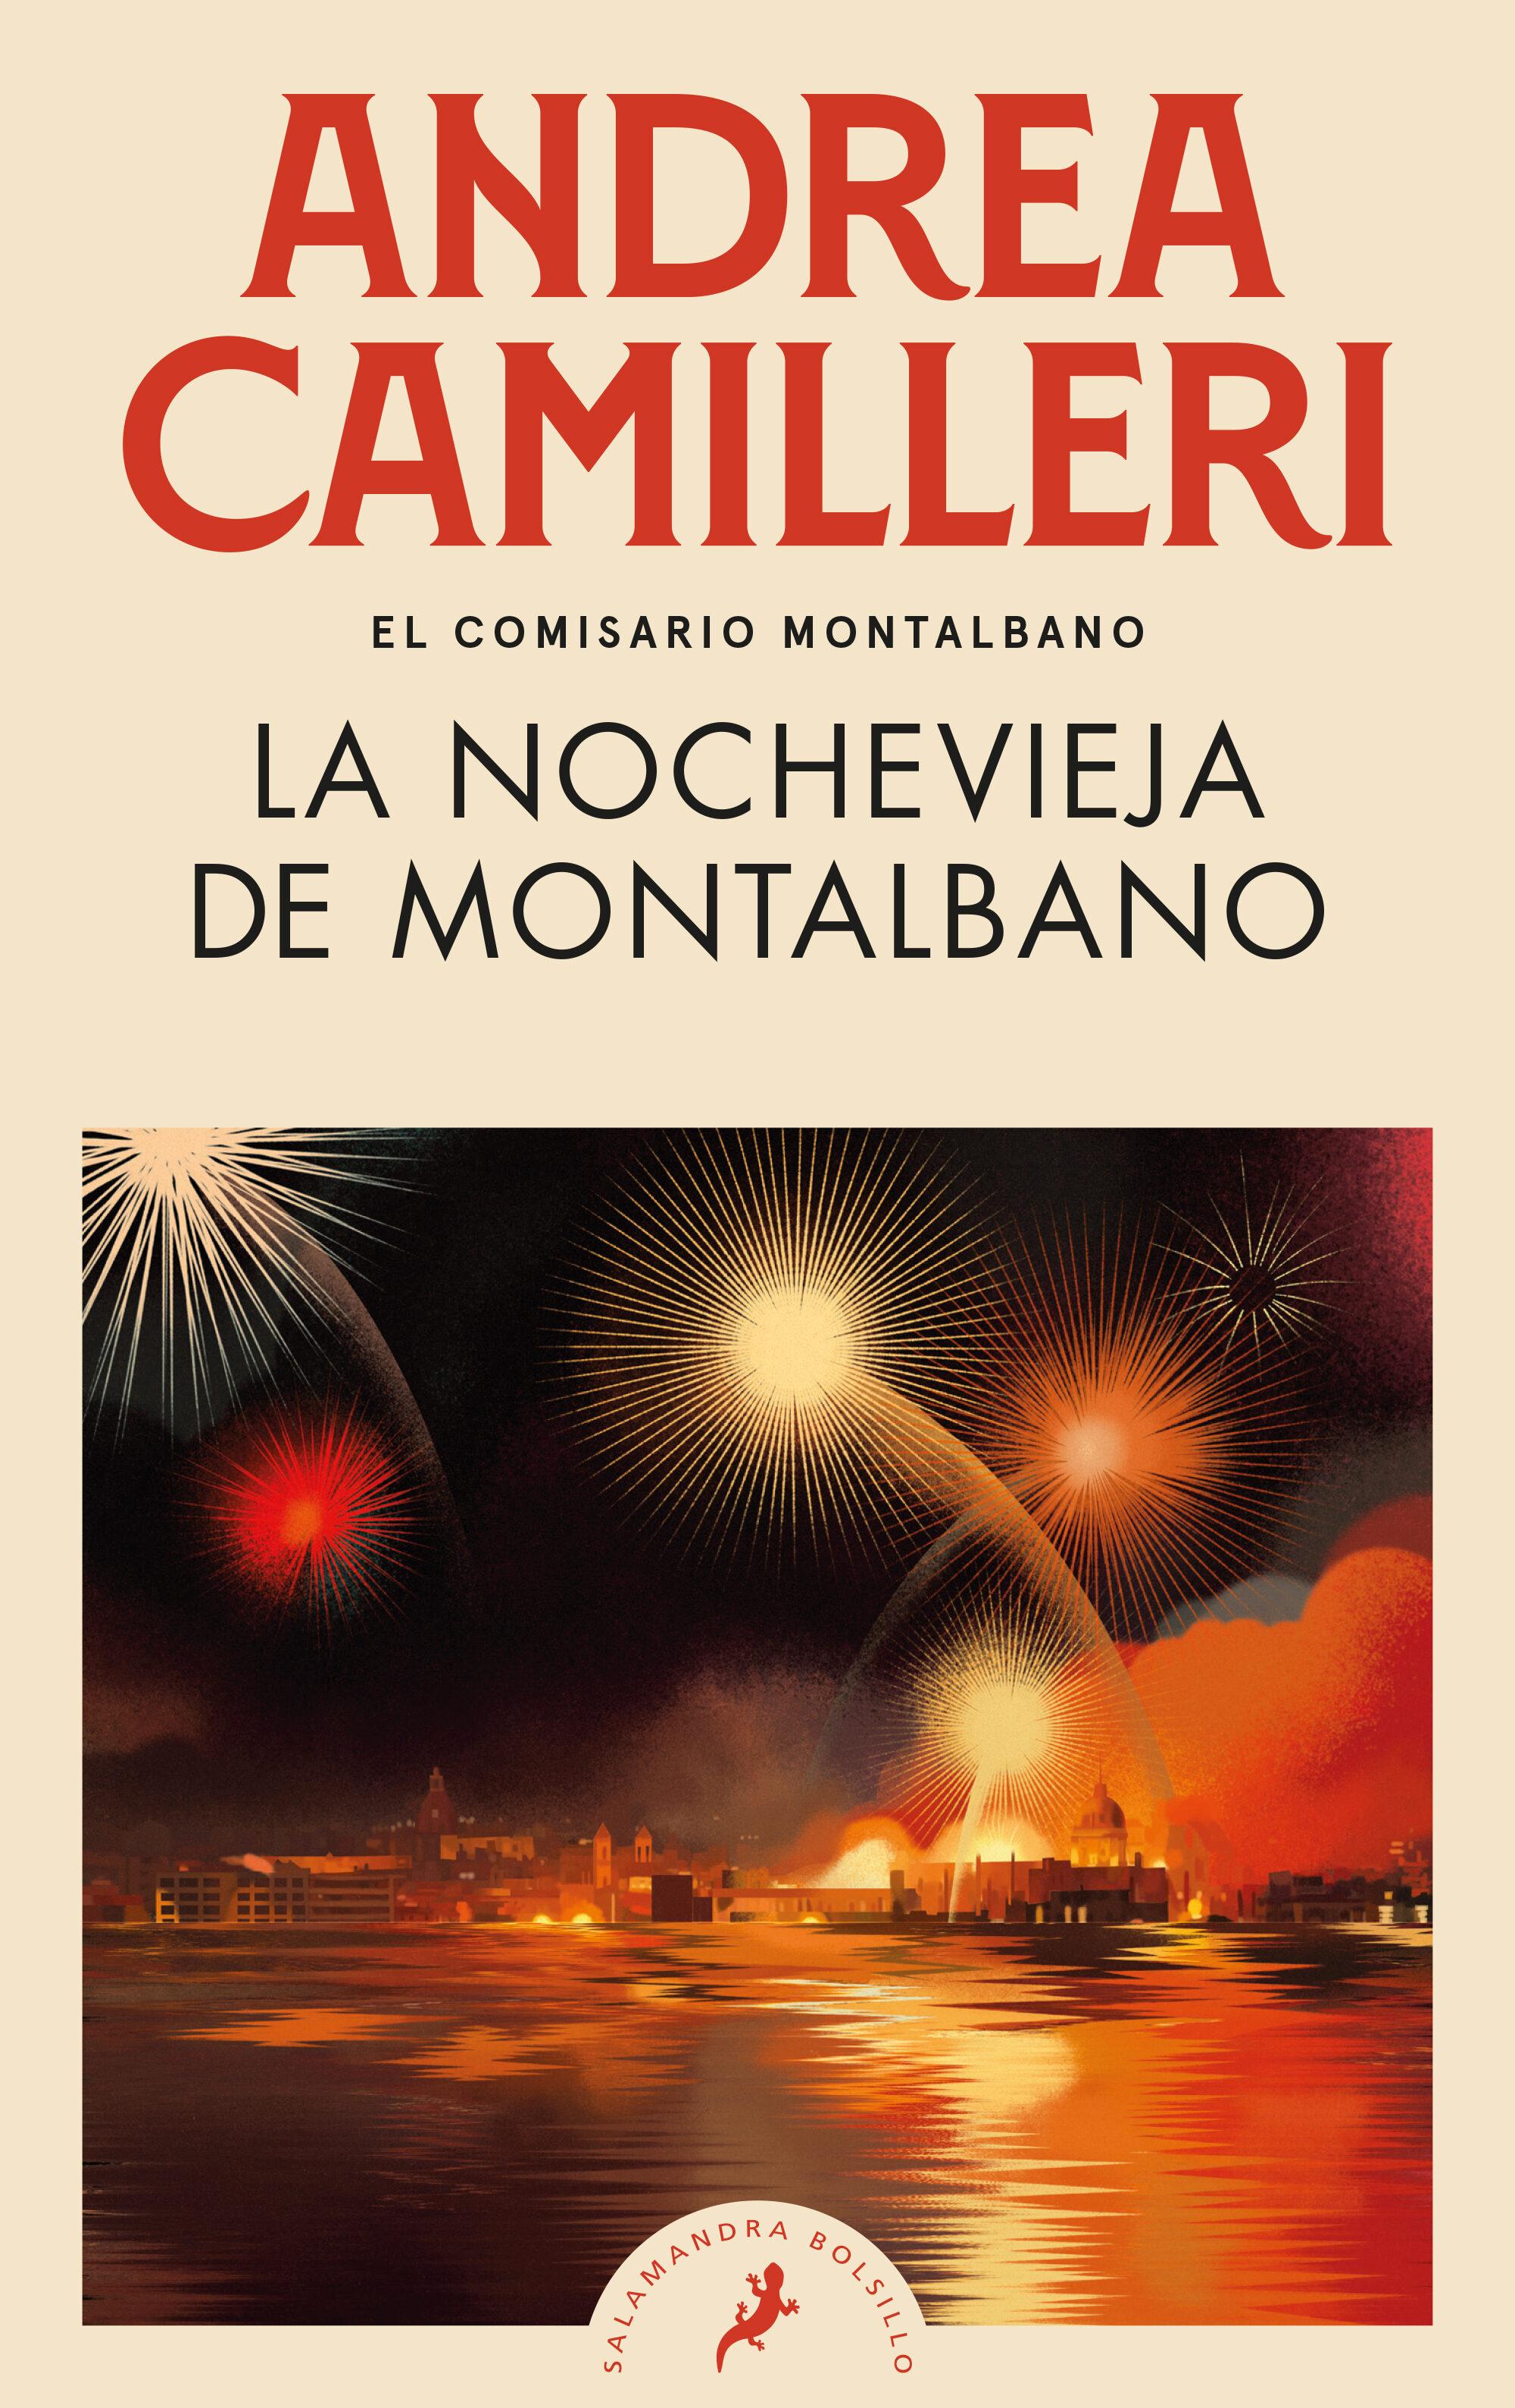 La Nochevieja De Montalbano (comisario Montalbano 6) - Camilleri Andrea